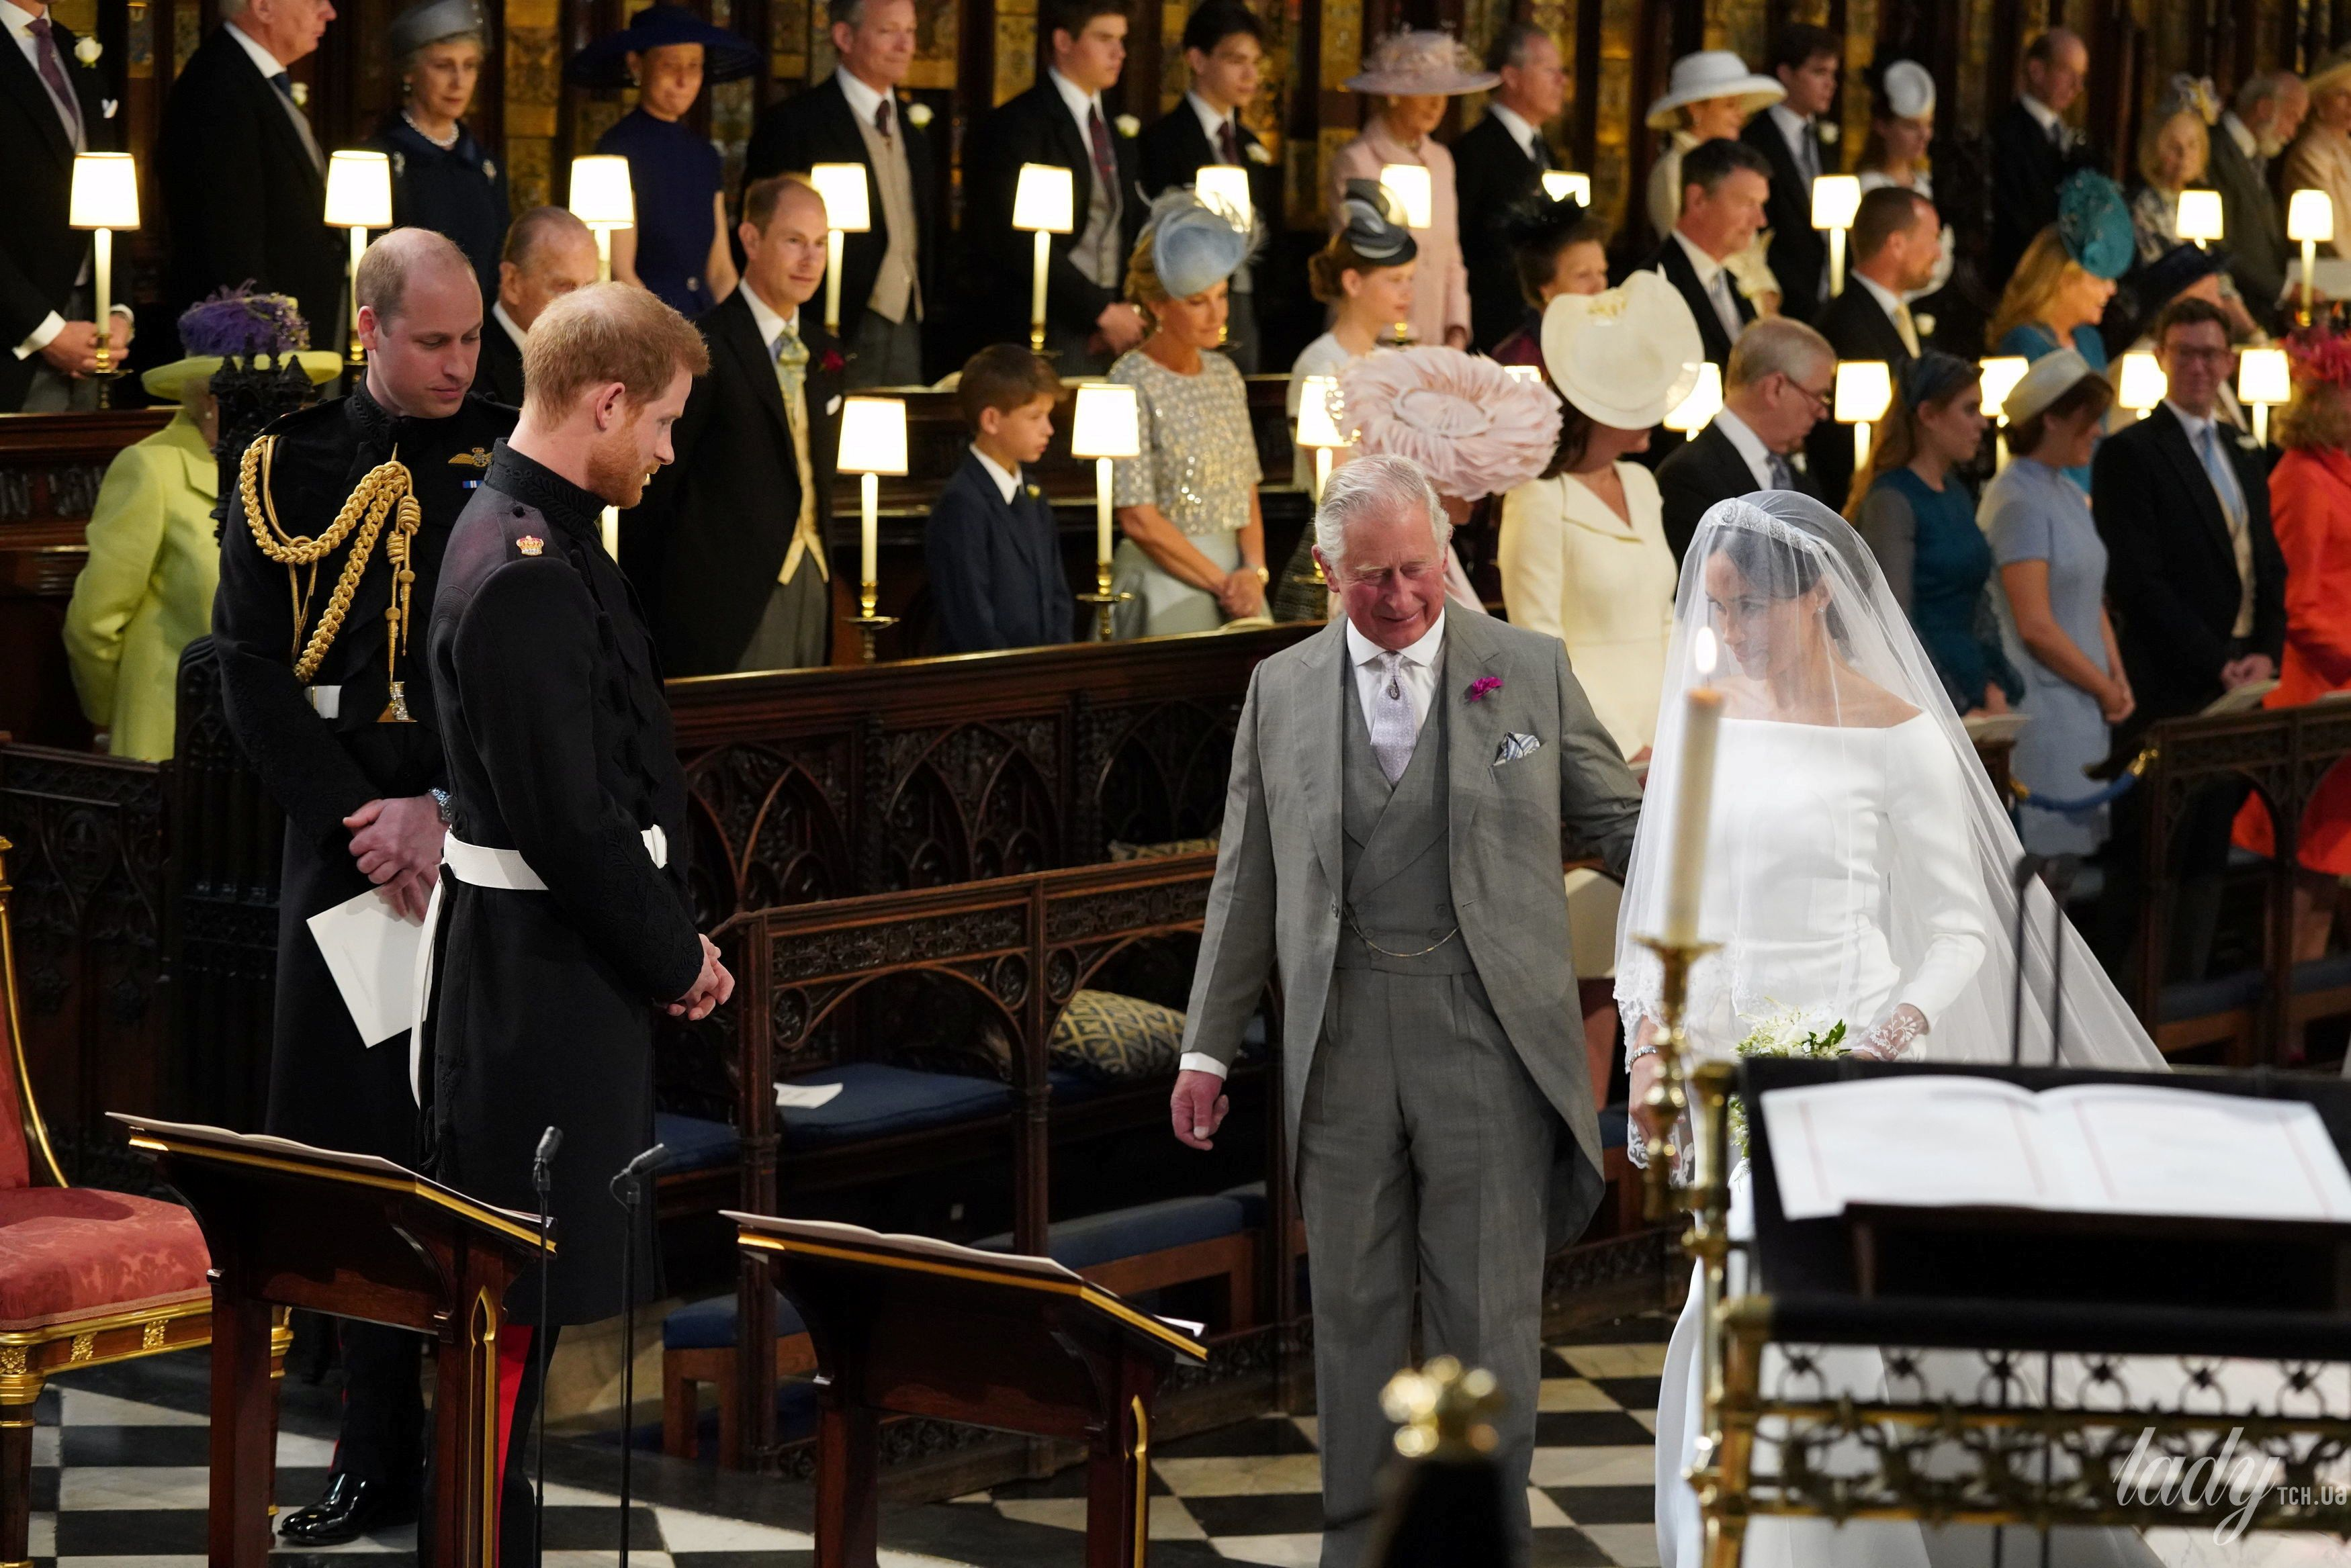 Свадьба Меган Маркл и принца Гарри_3